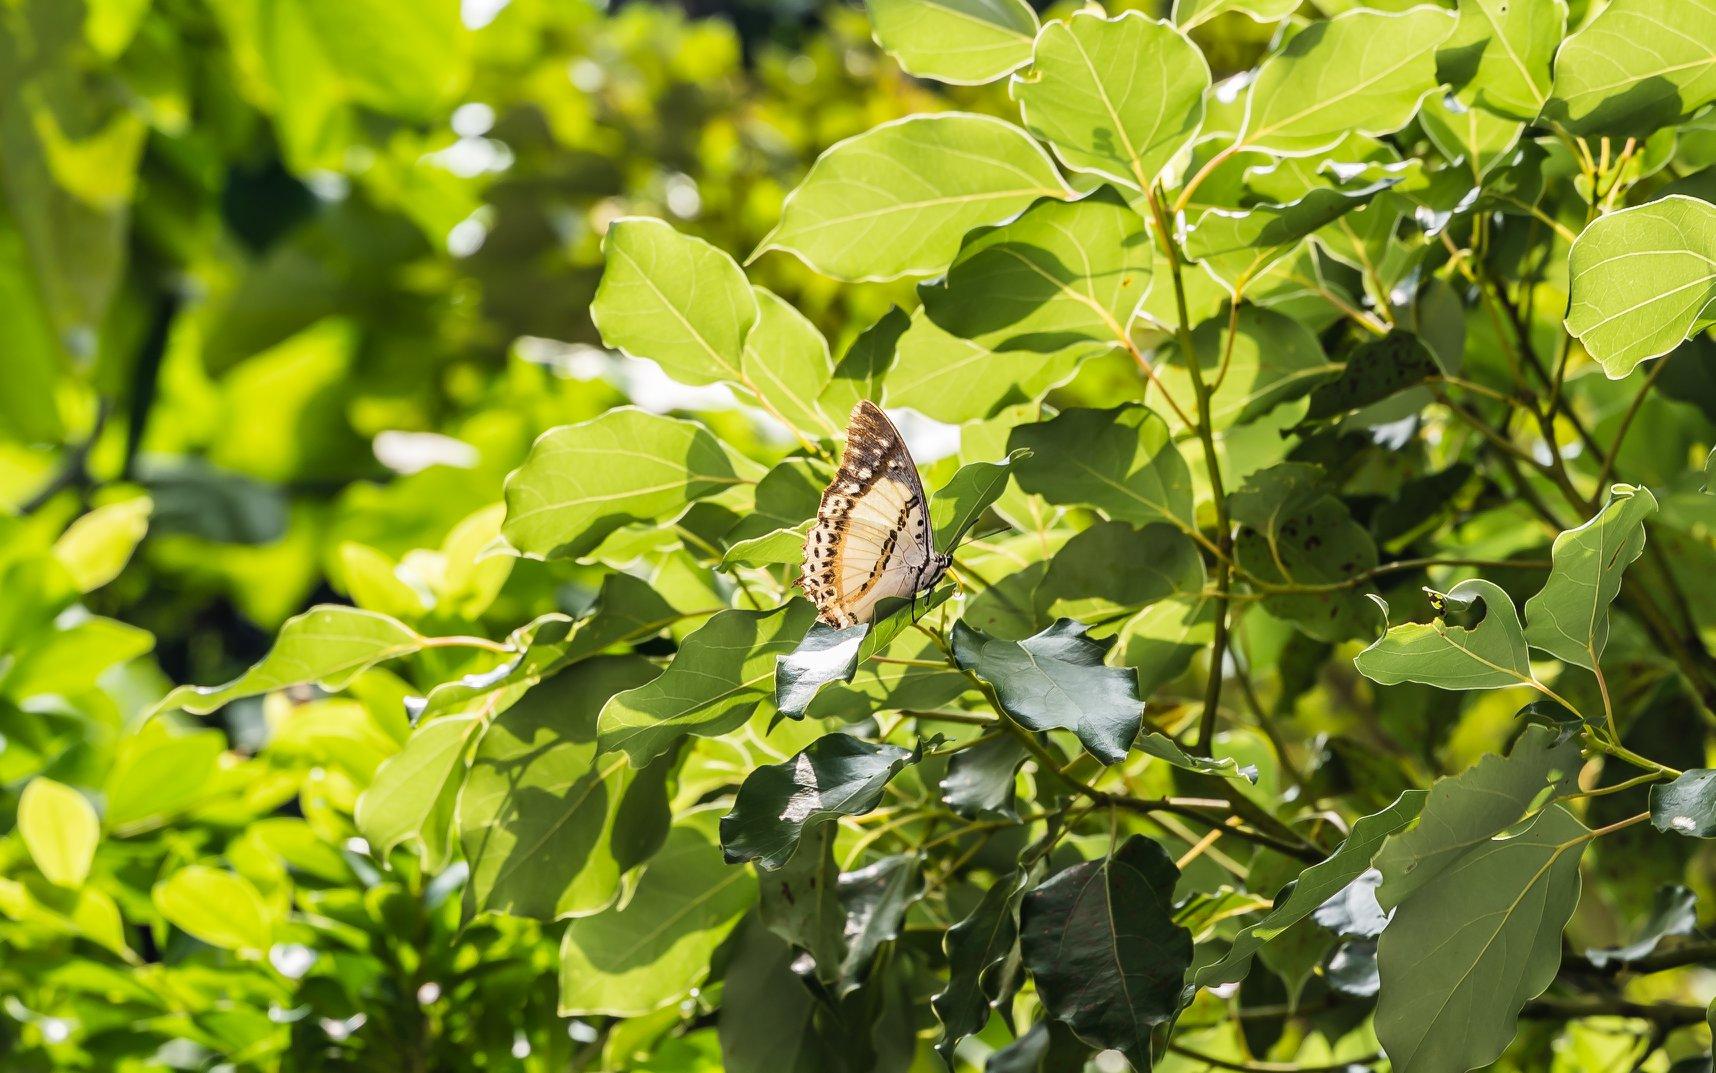 忘憂尾蛺蝶 Shan Nawab (Polyura nepenthes)